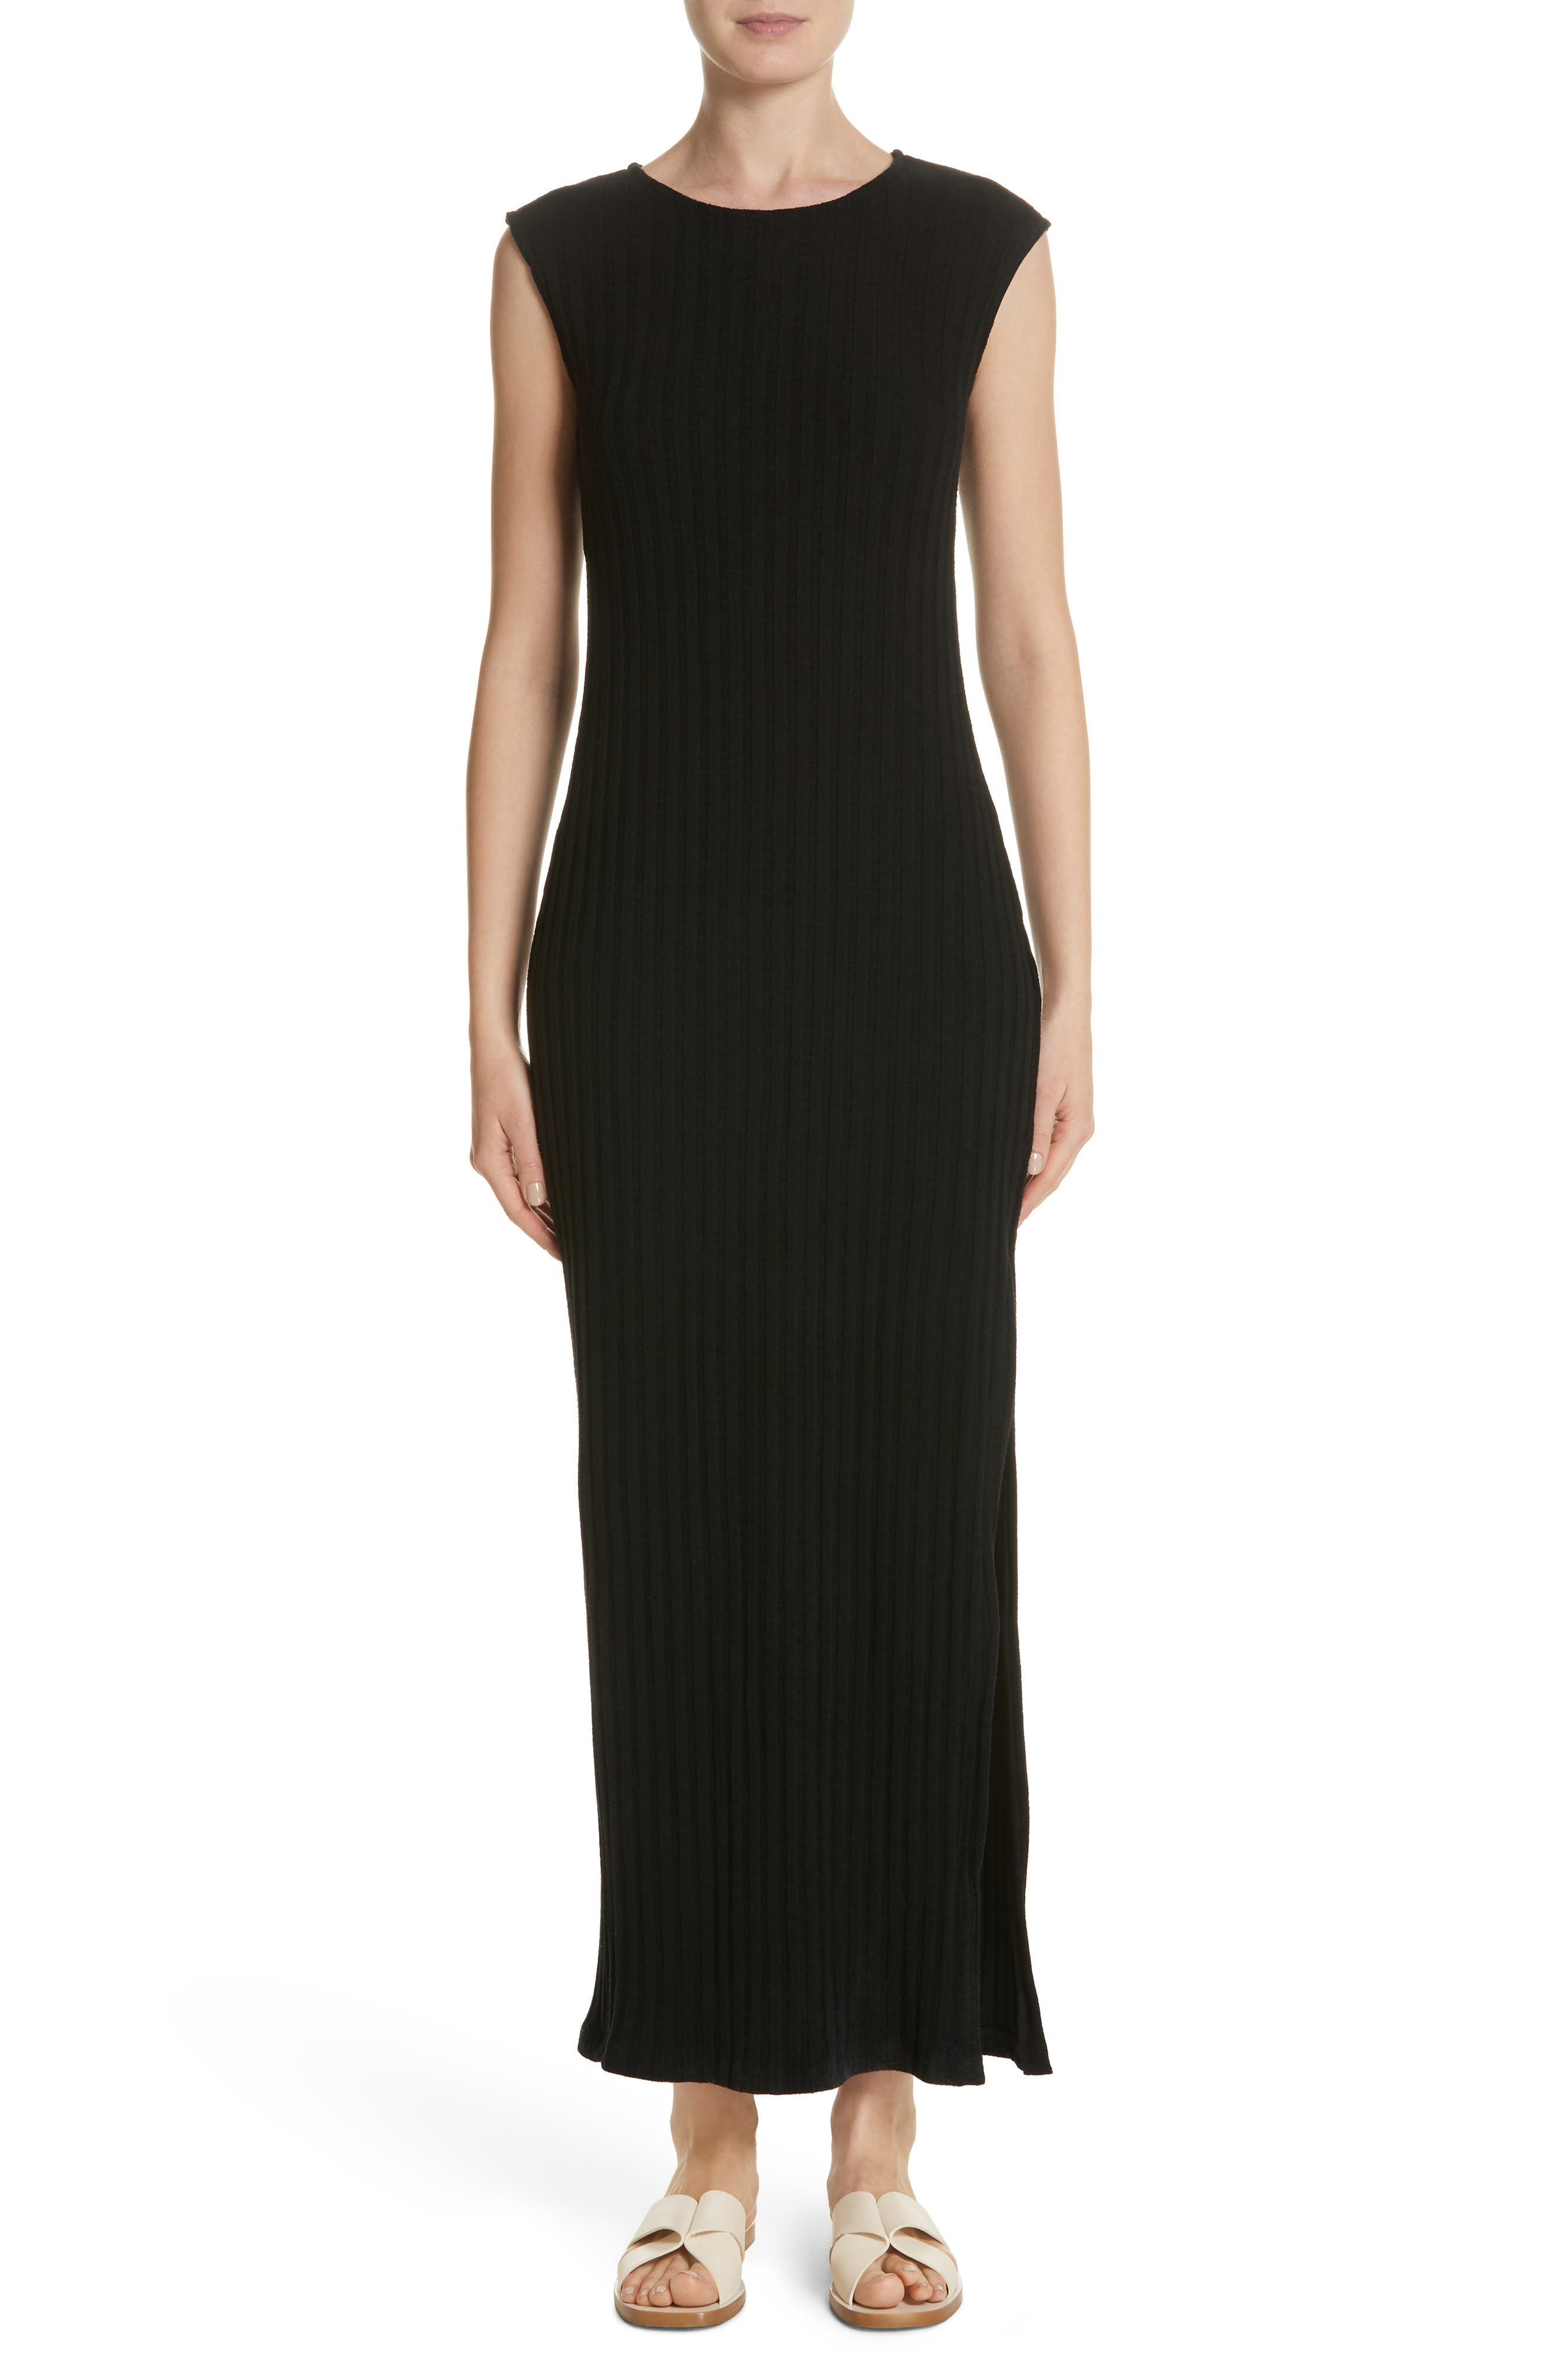 Simon Miller Tali Stretch Ribbed Body-Con Dress